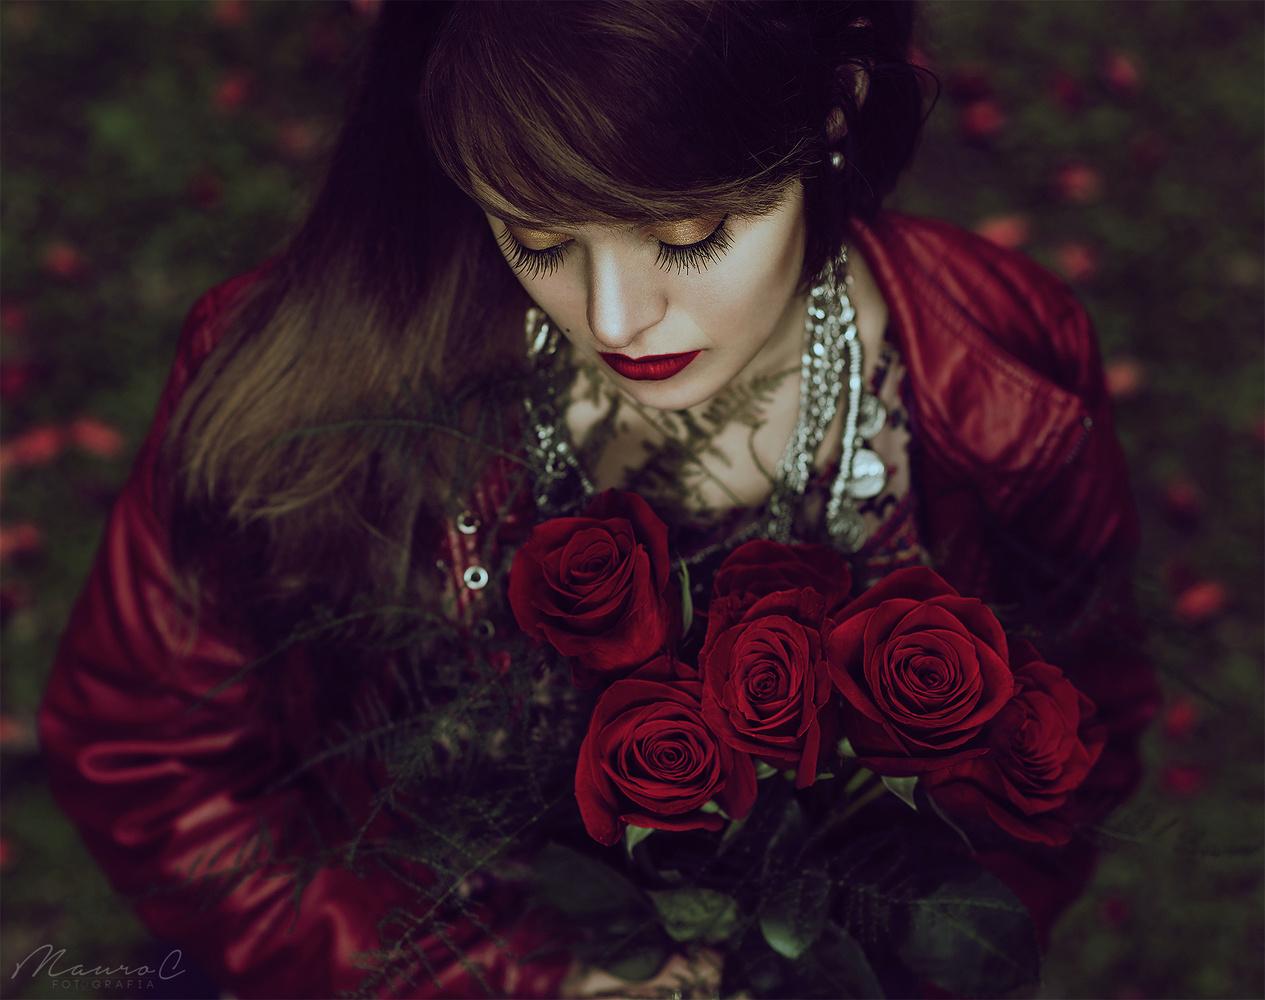 Roses by Mauro Chito